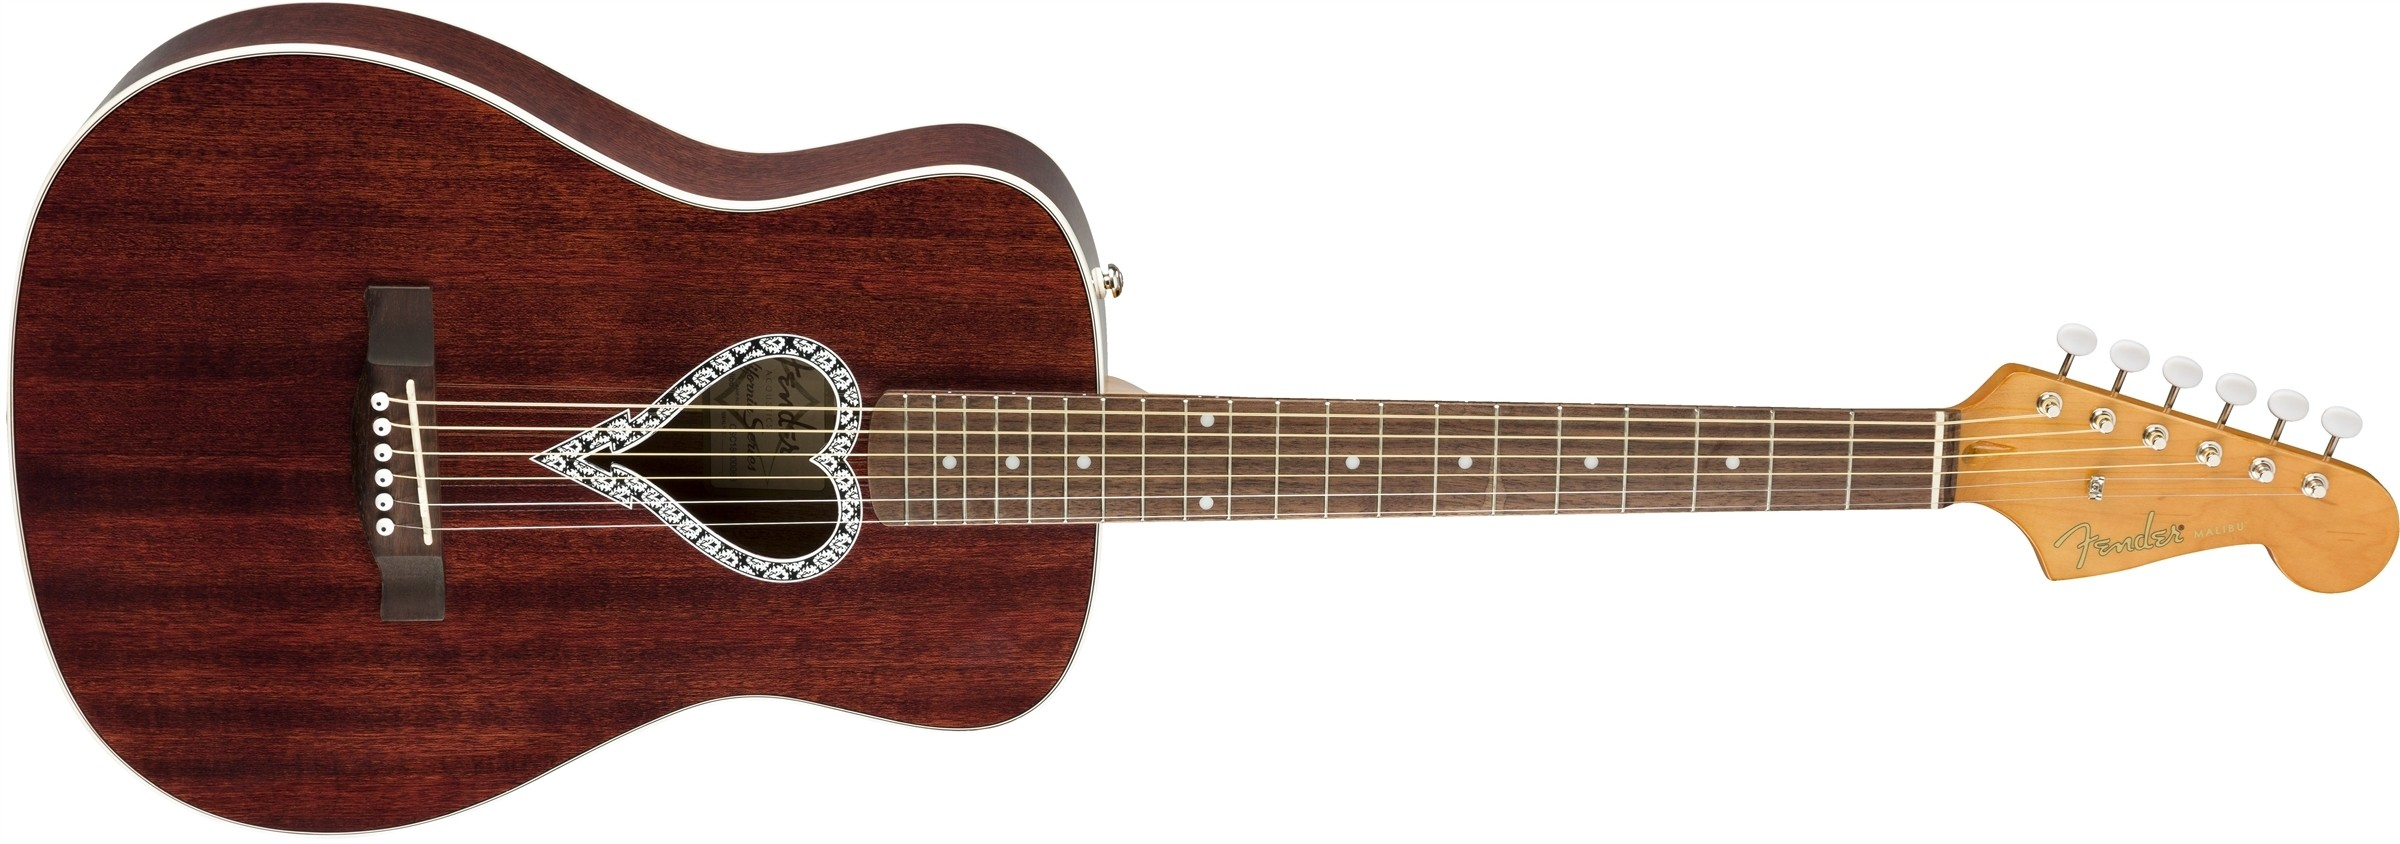 Fender Alkaline Trio Malibu akustisk gitar